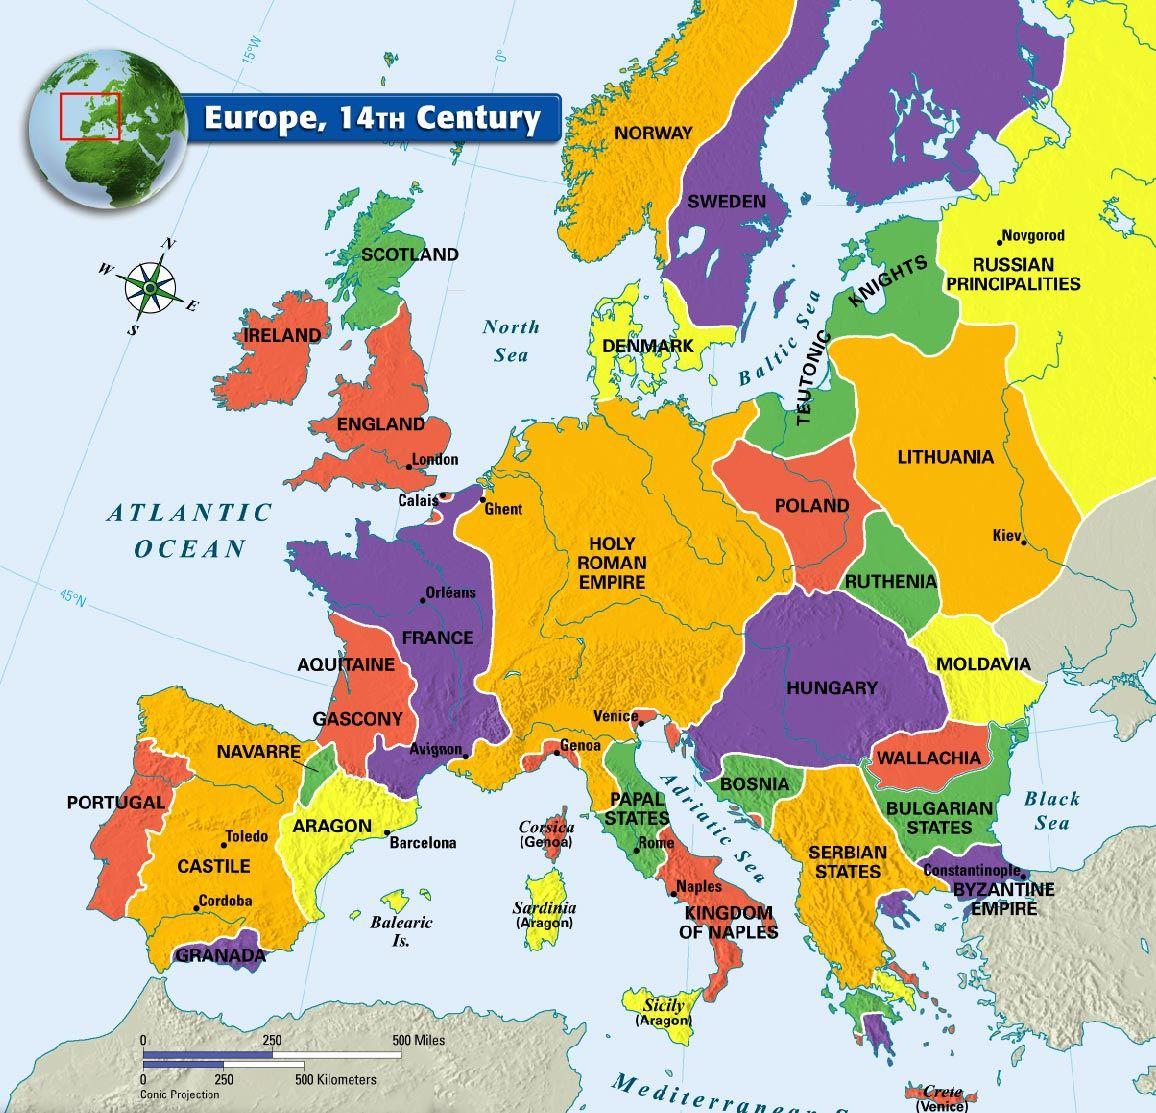 Europe 14th Century Map